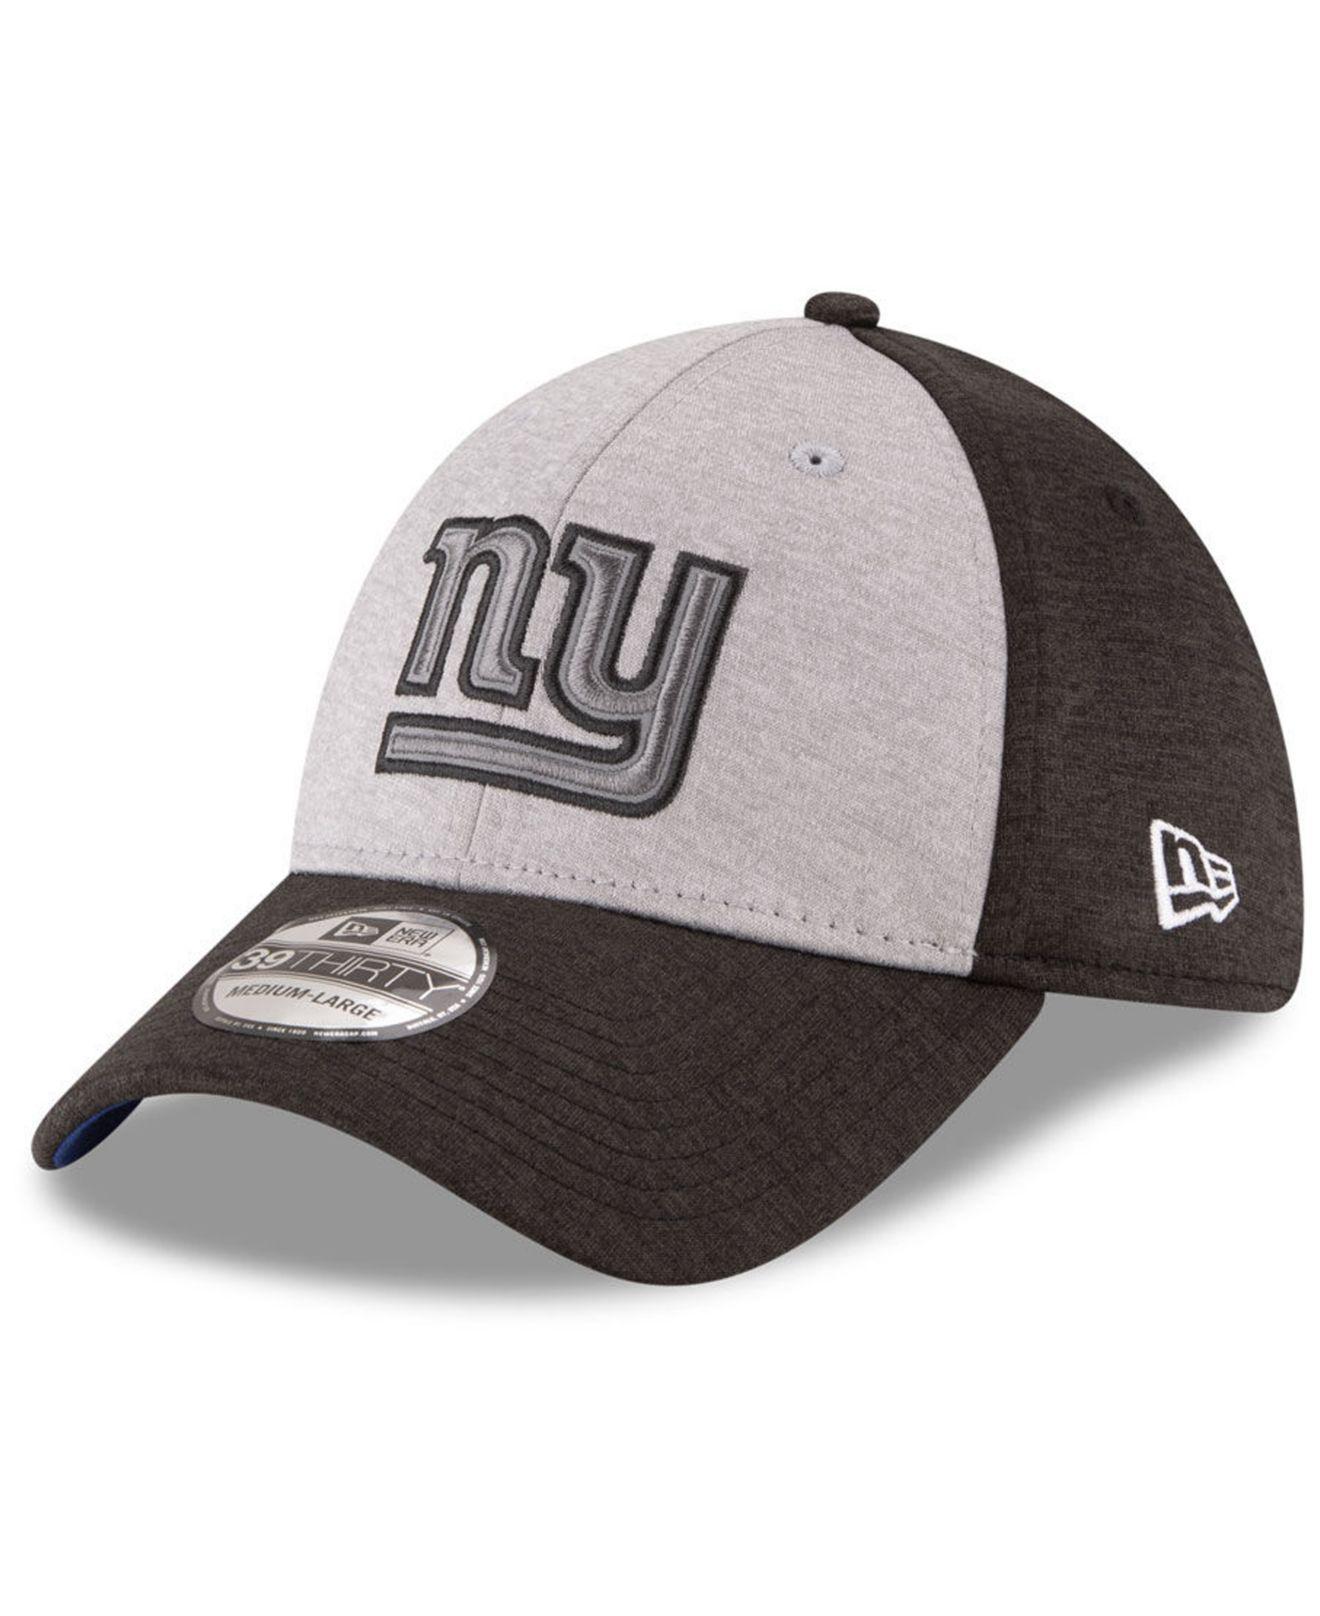 Lyst - Ktz New York Giants Ref Logo 39thirty Cap in Gray for Men 5fea5b83d